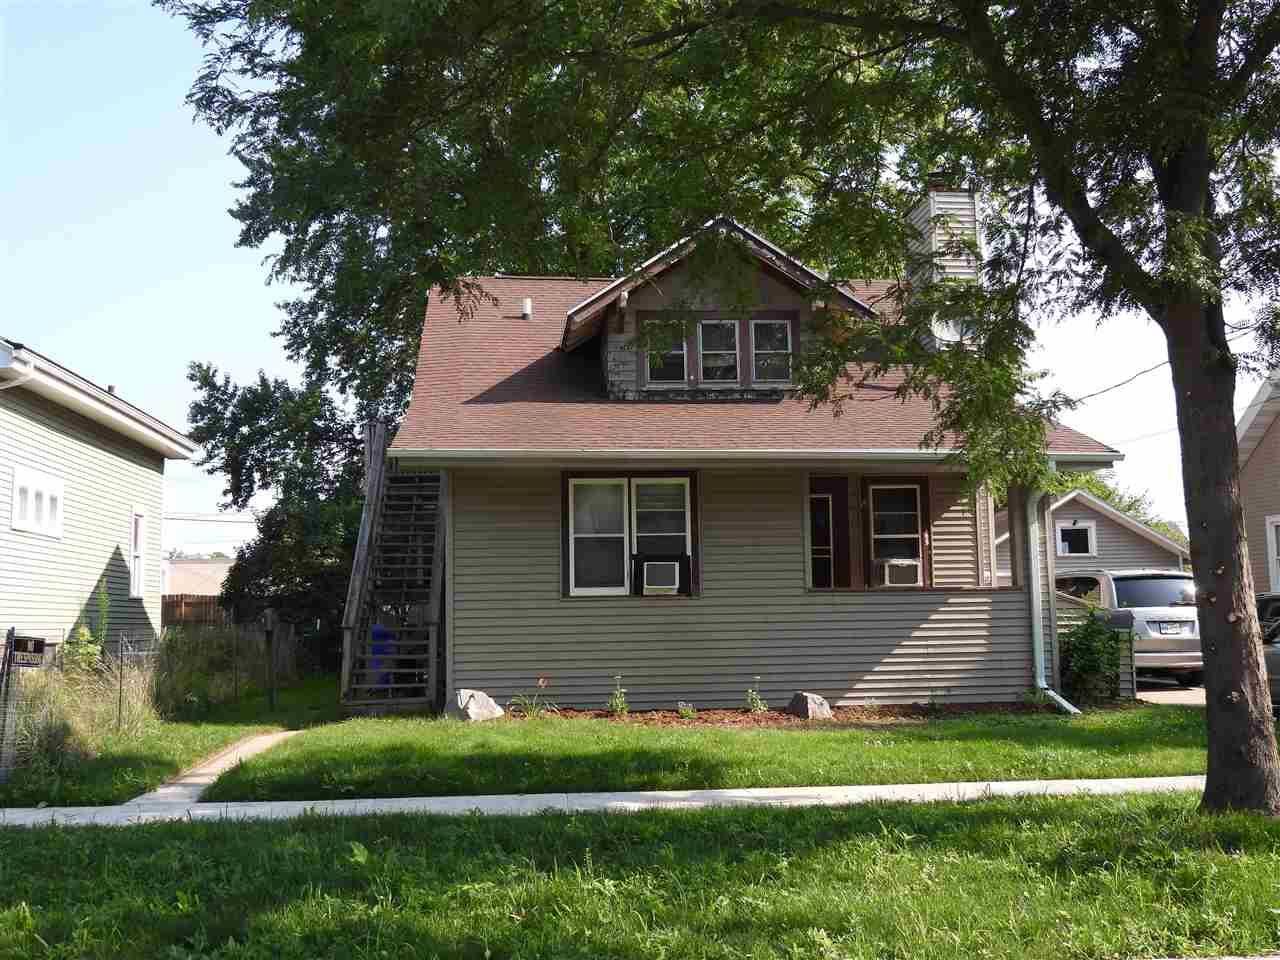 818 W SUMMER Street, Appleton, WI 54914 - MLS#: 50244691